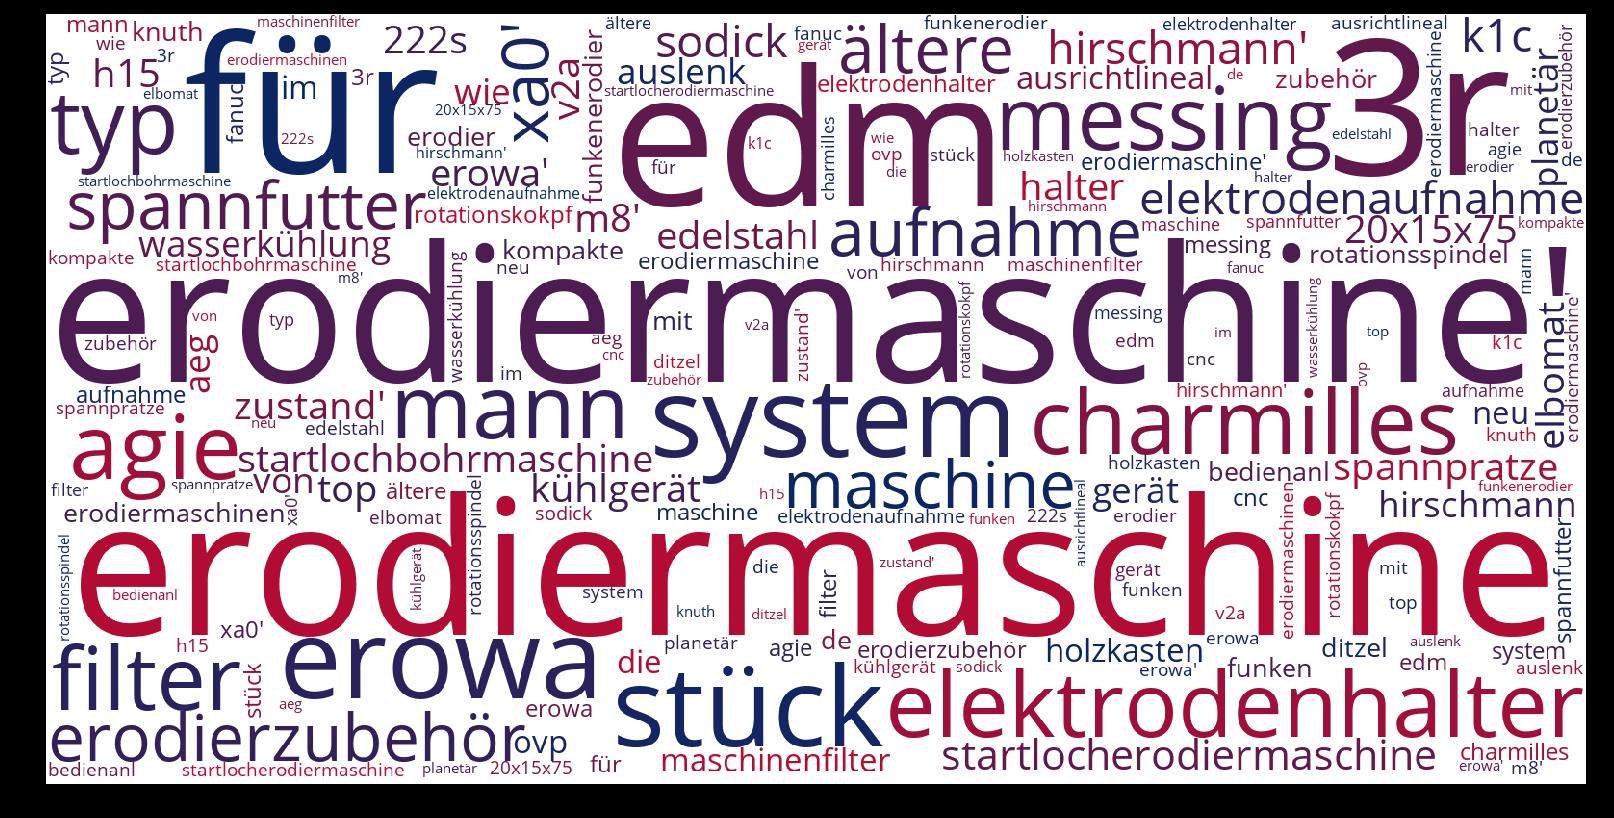 Erodiermaschine-wordcloud